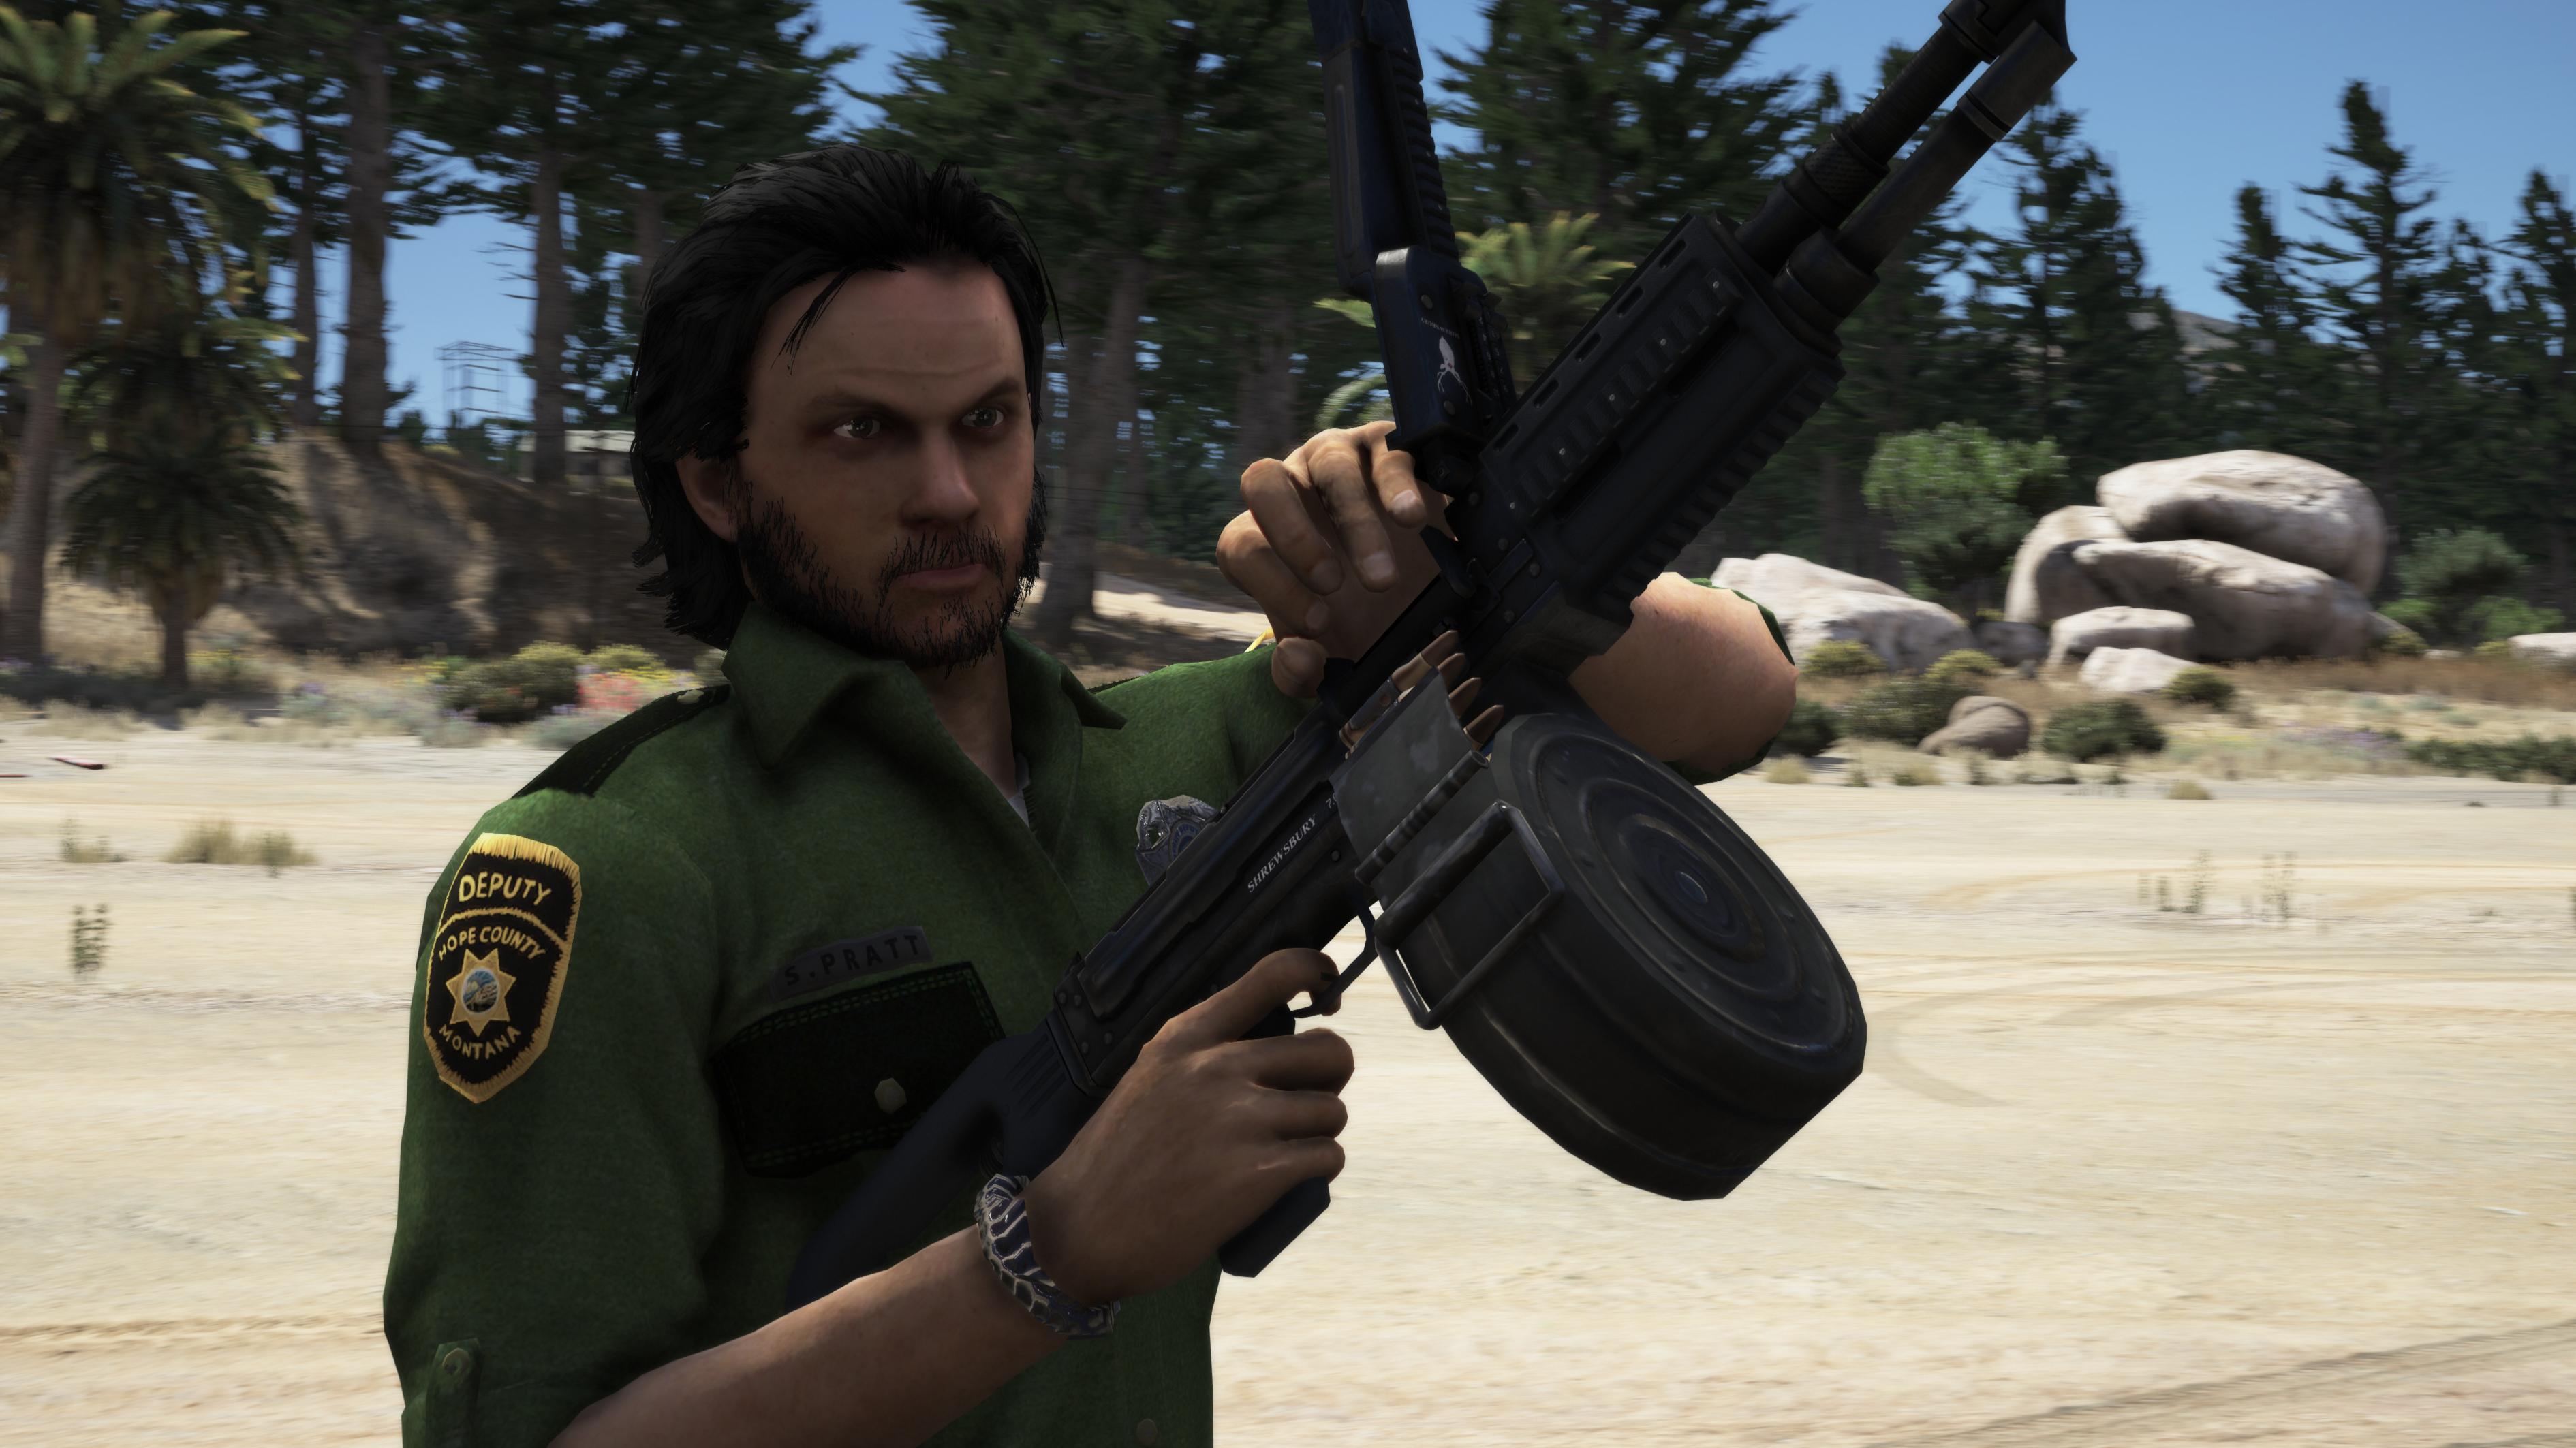 Far Cry 5 Deputy Pratt In Gta 5 By Connorukboy On Deviantart